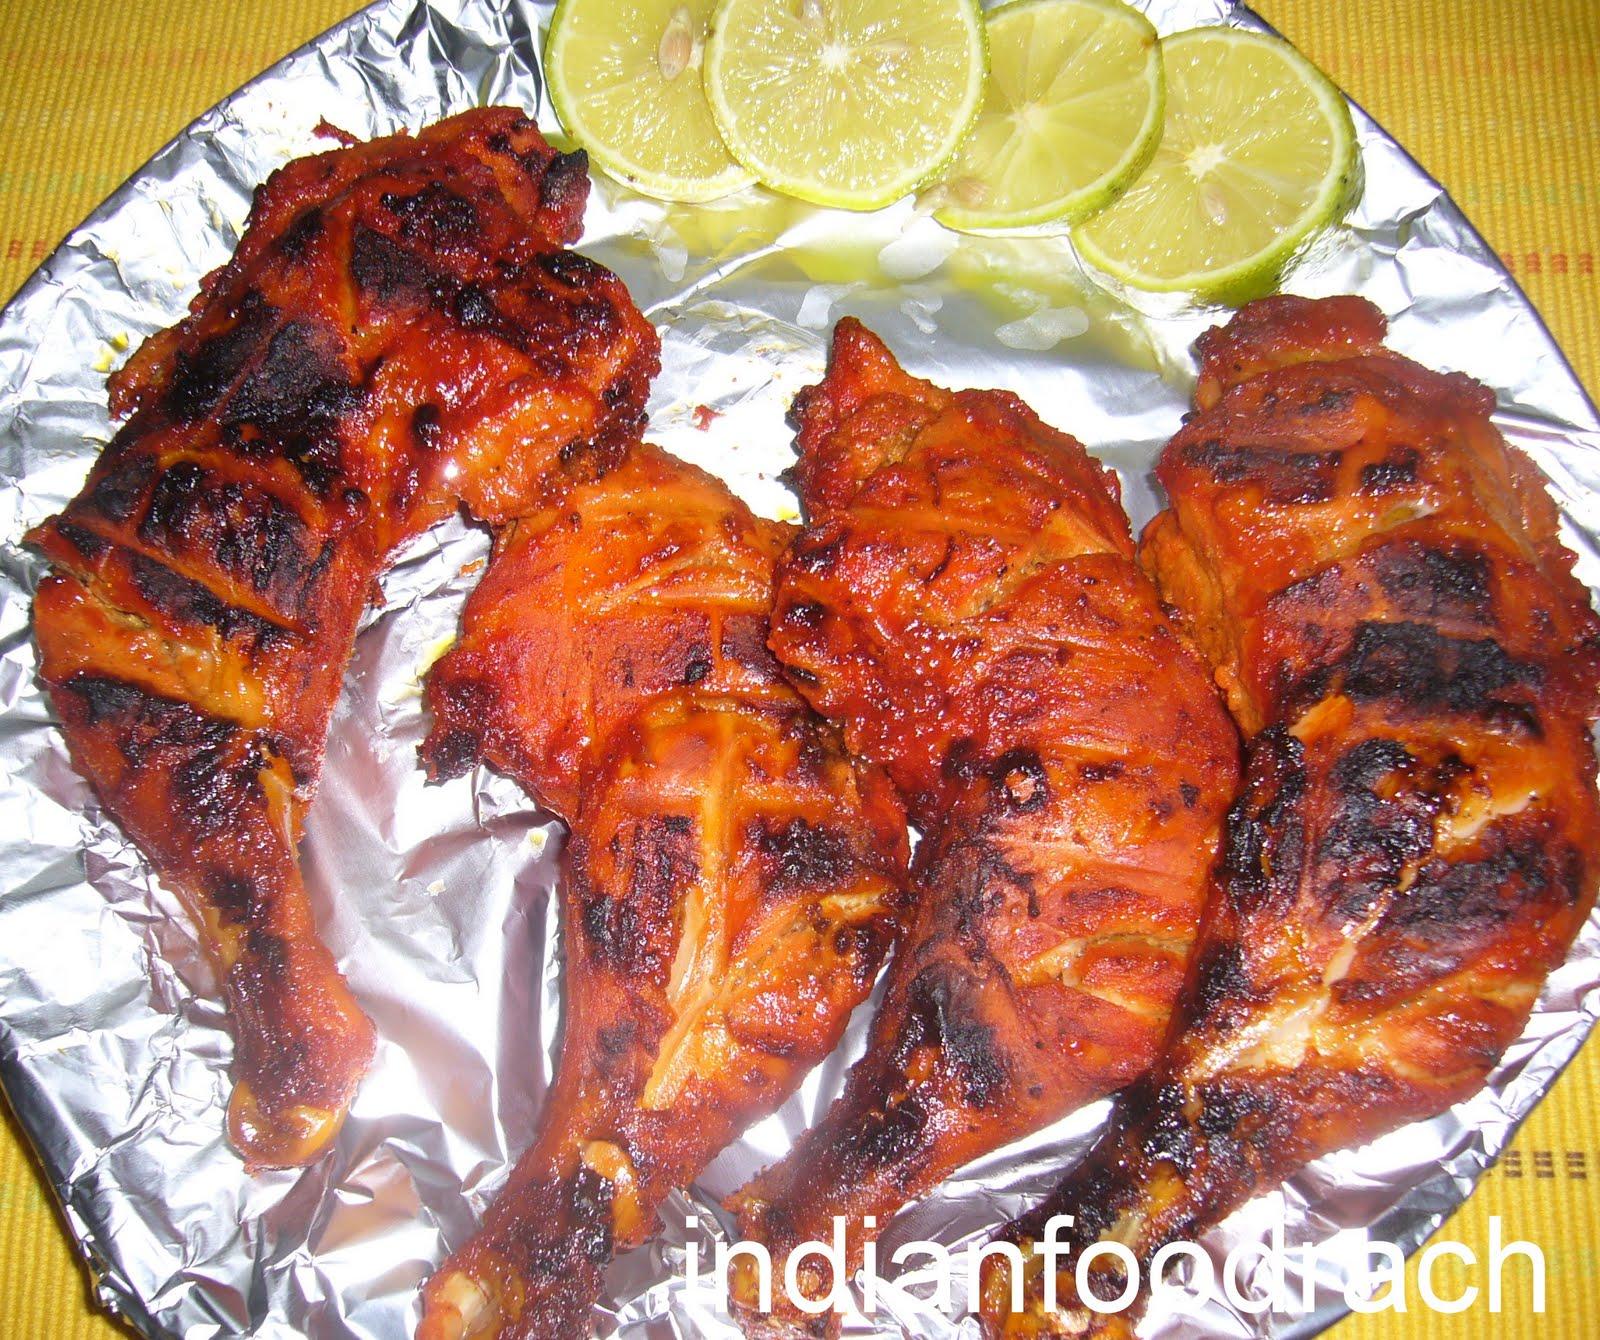 INDIAN FOOD: Tandoori chicken (Tandoori murg/murgh)